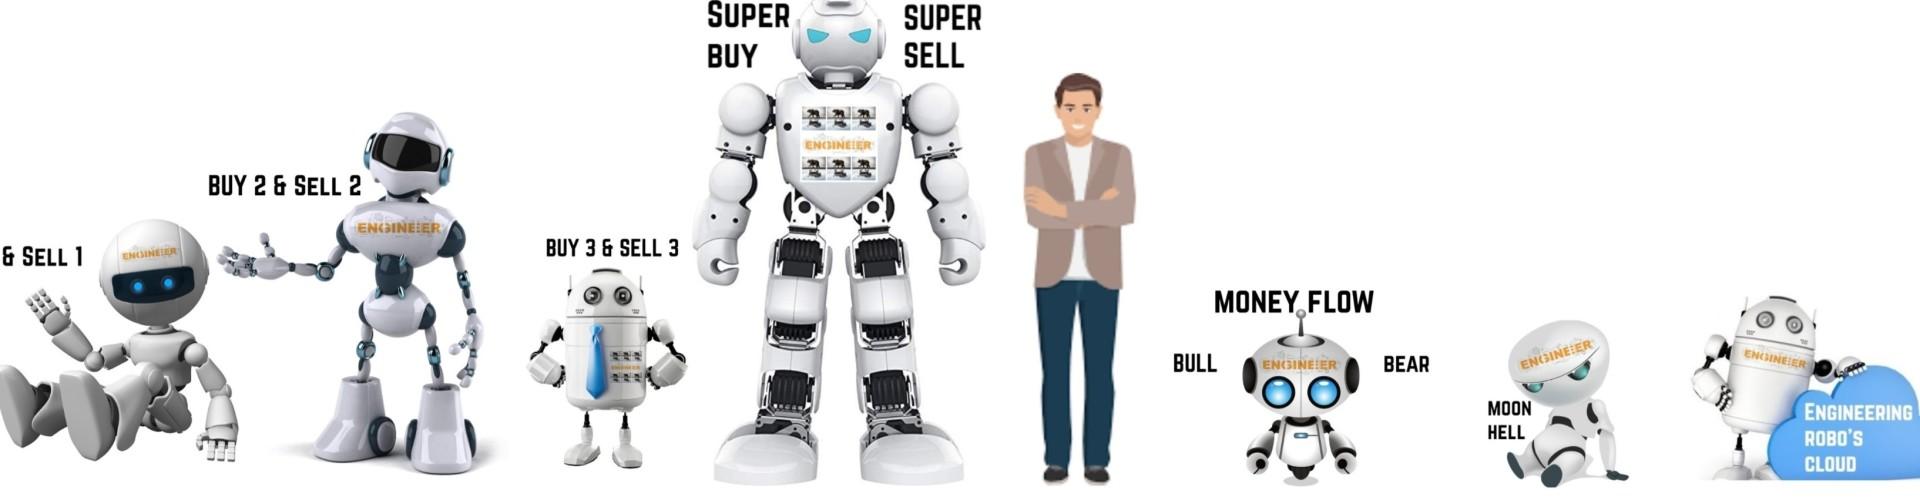 EngineeringRobo